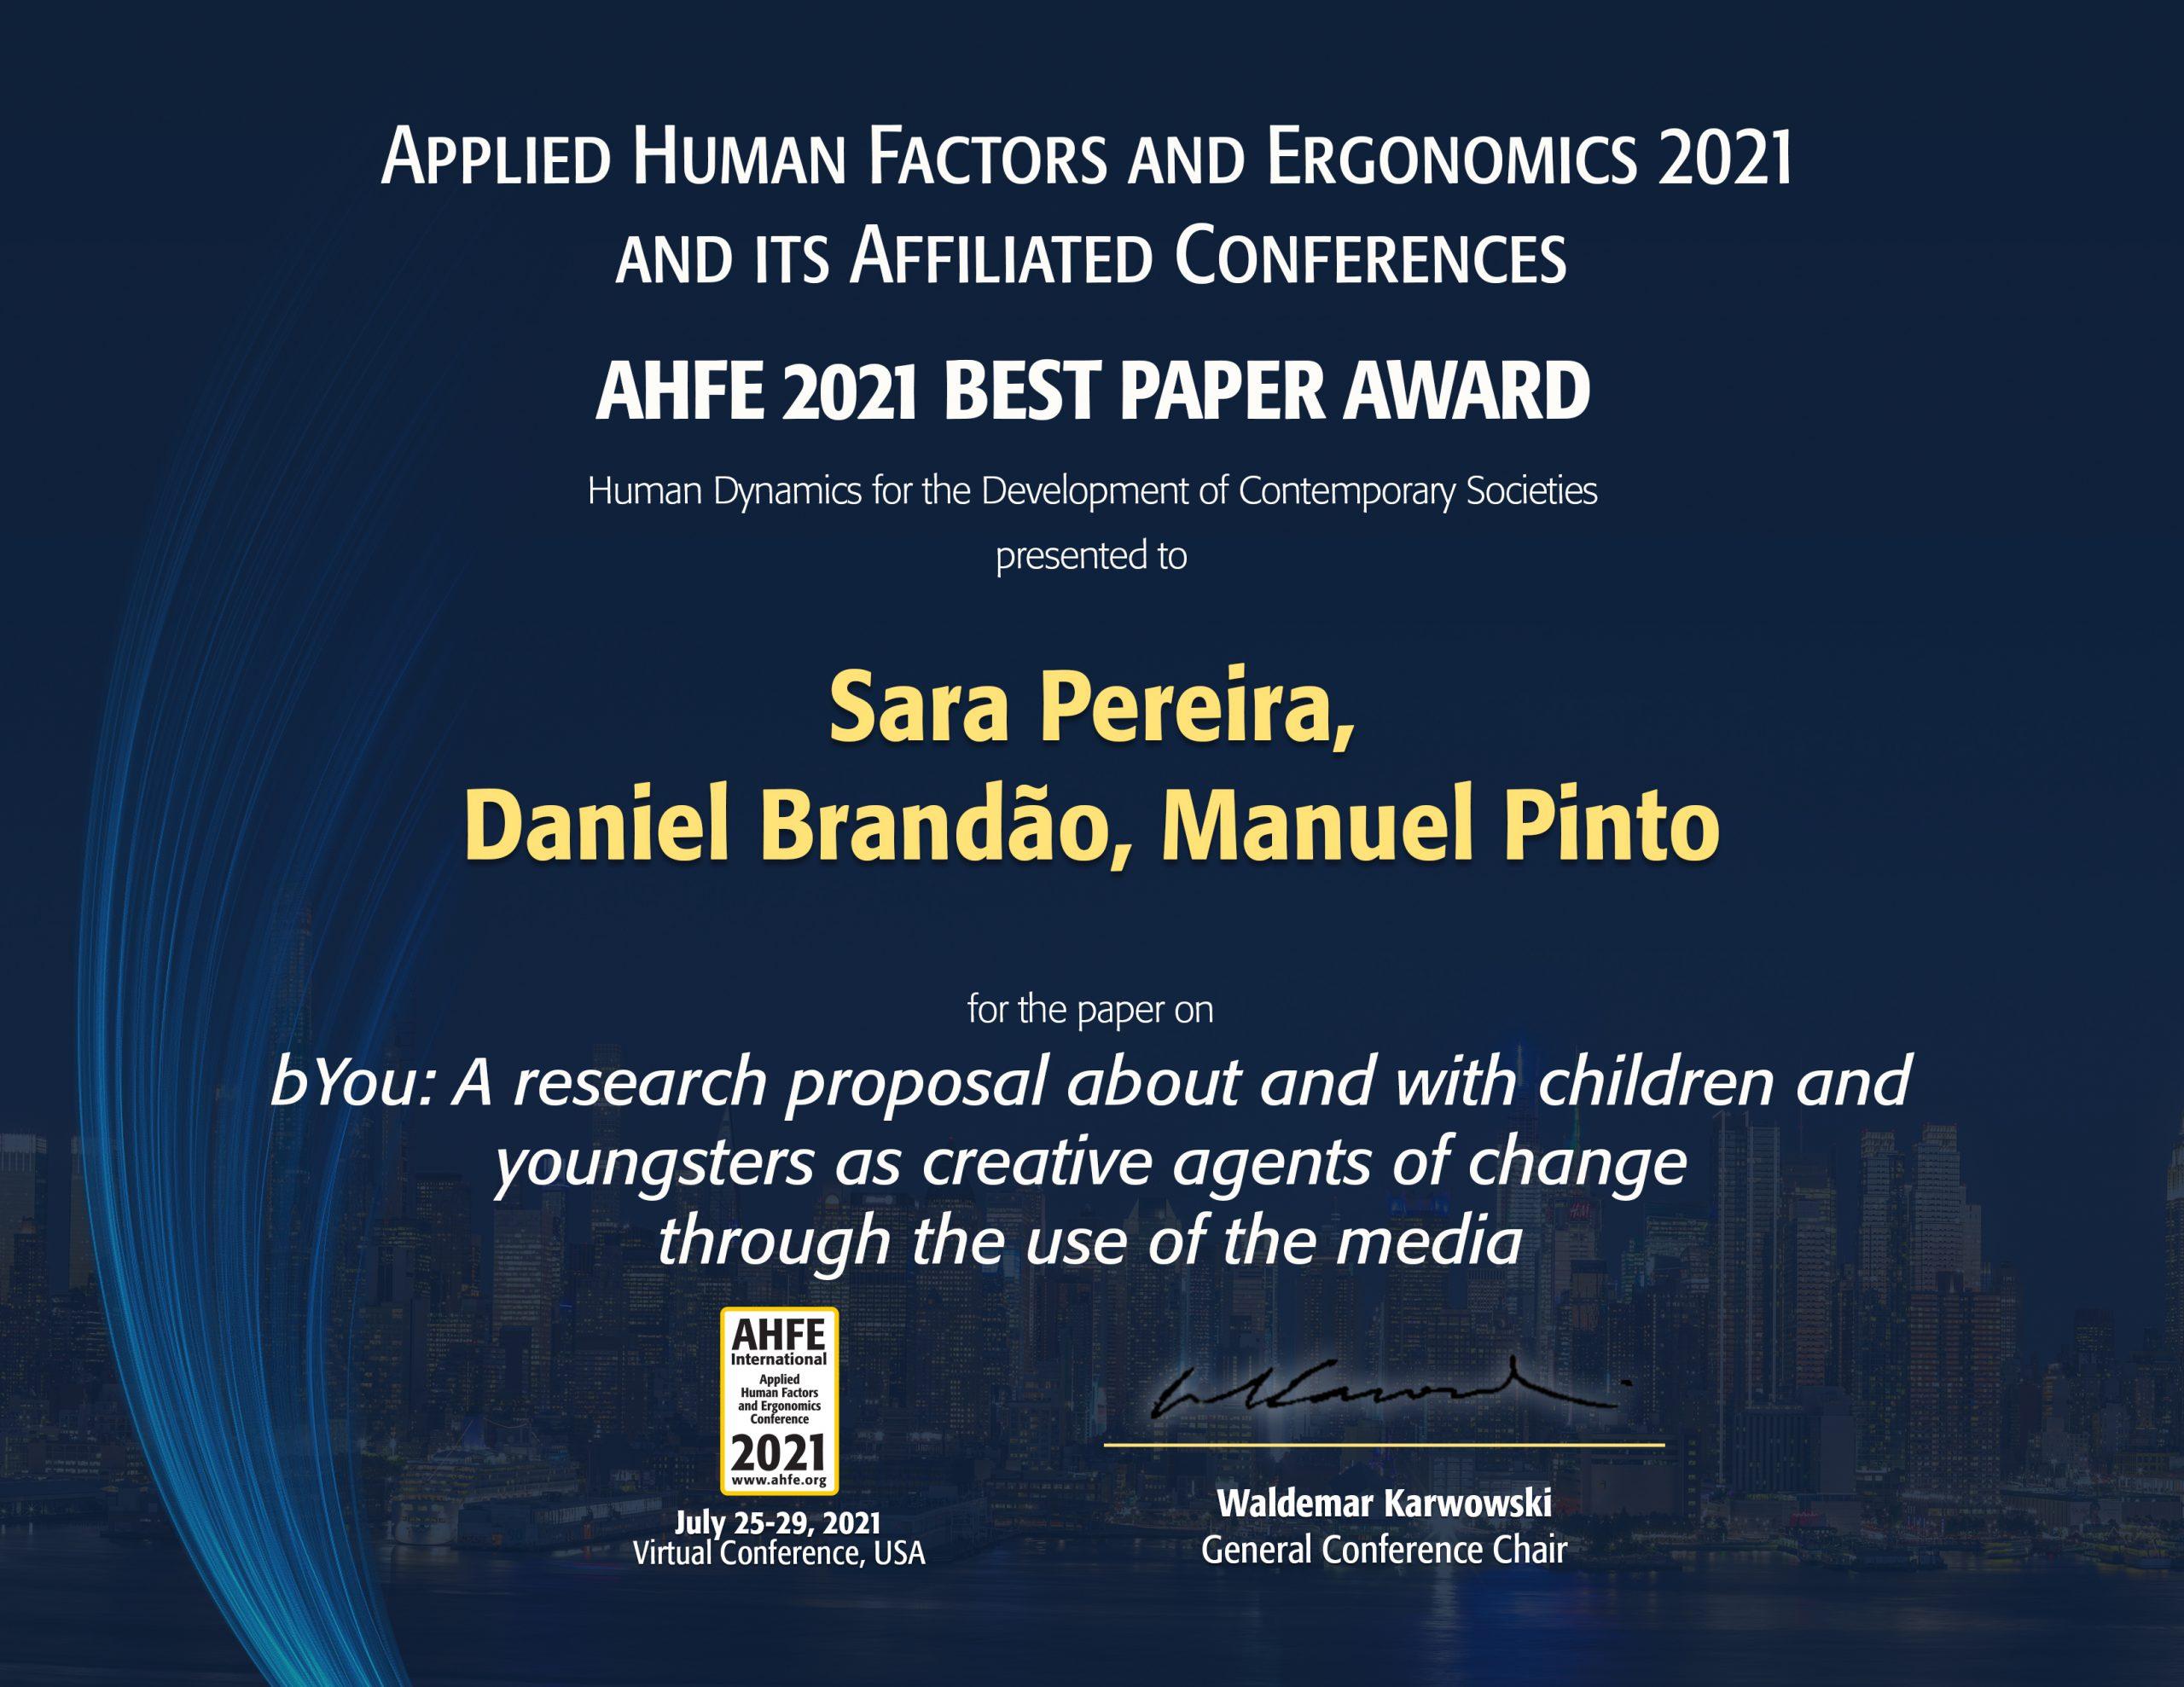 Investigadores do CECS ganham AHFE 2021 Best Paper Award